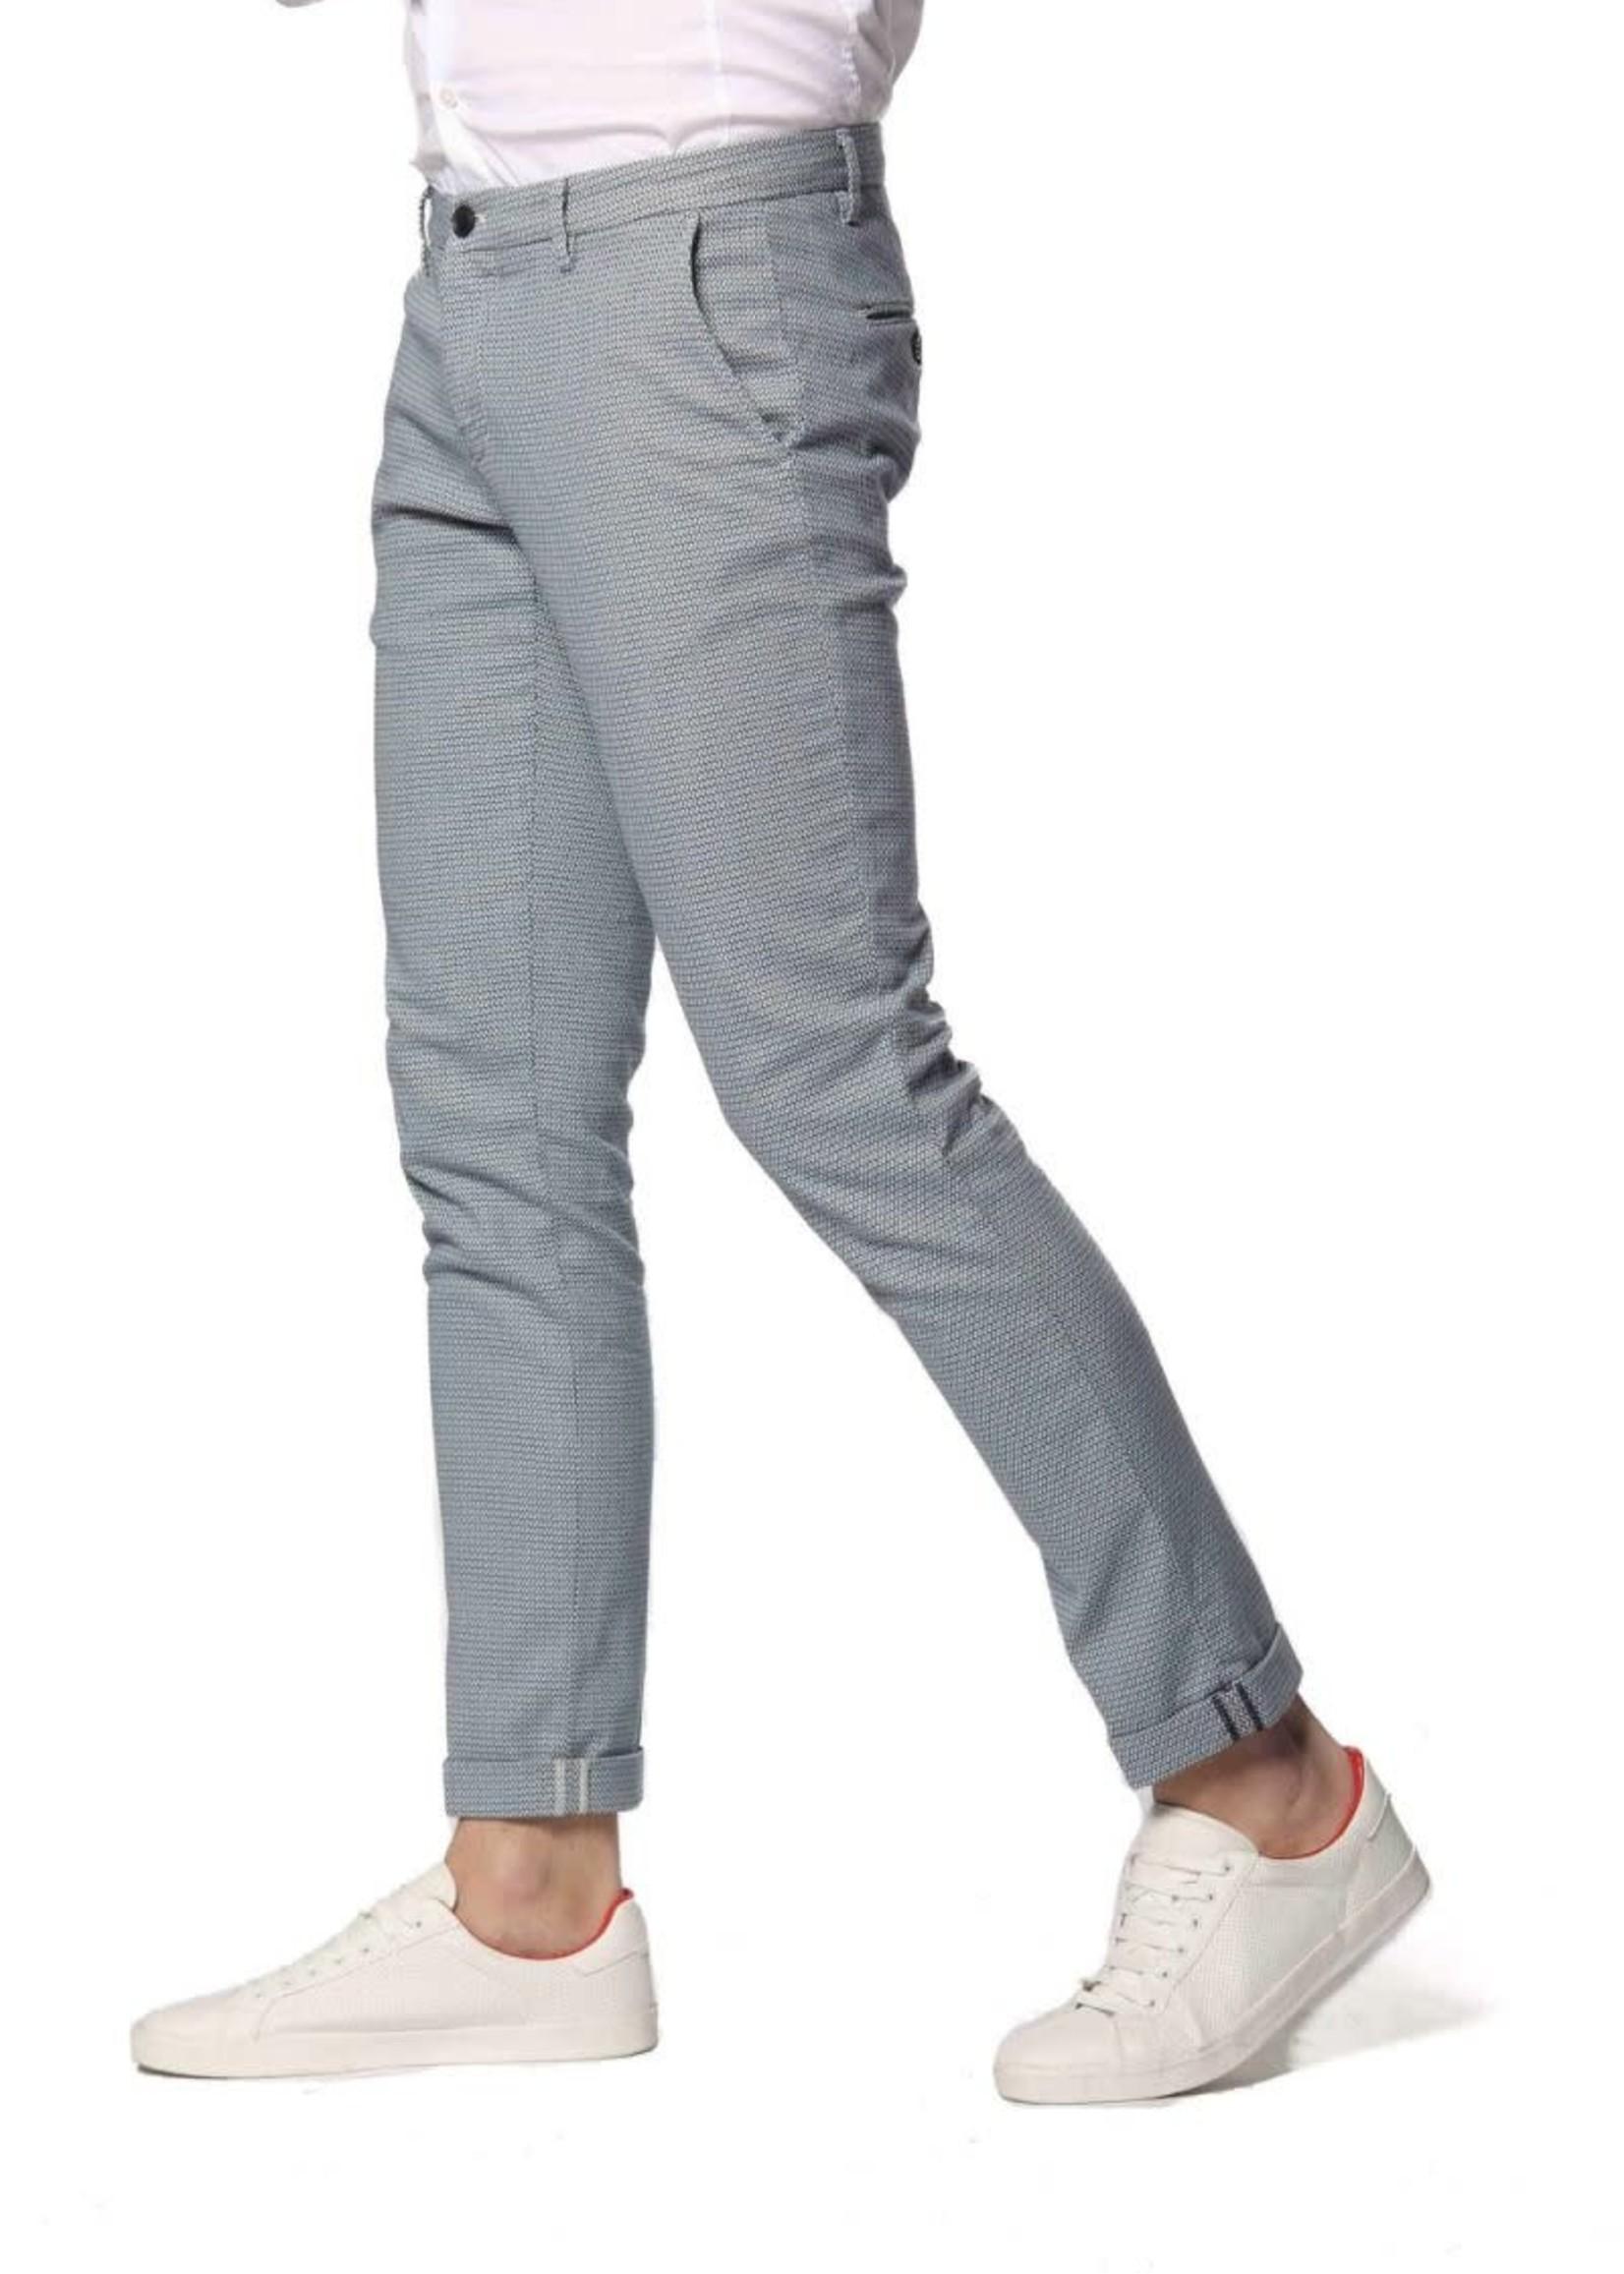 Mason's Pantalon en jacquard imprimé coupe extra slim Milano Style | Bleu | Mason's